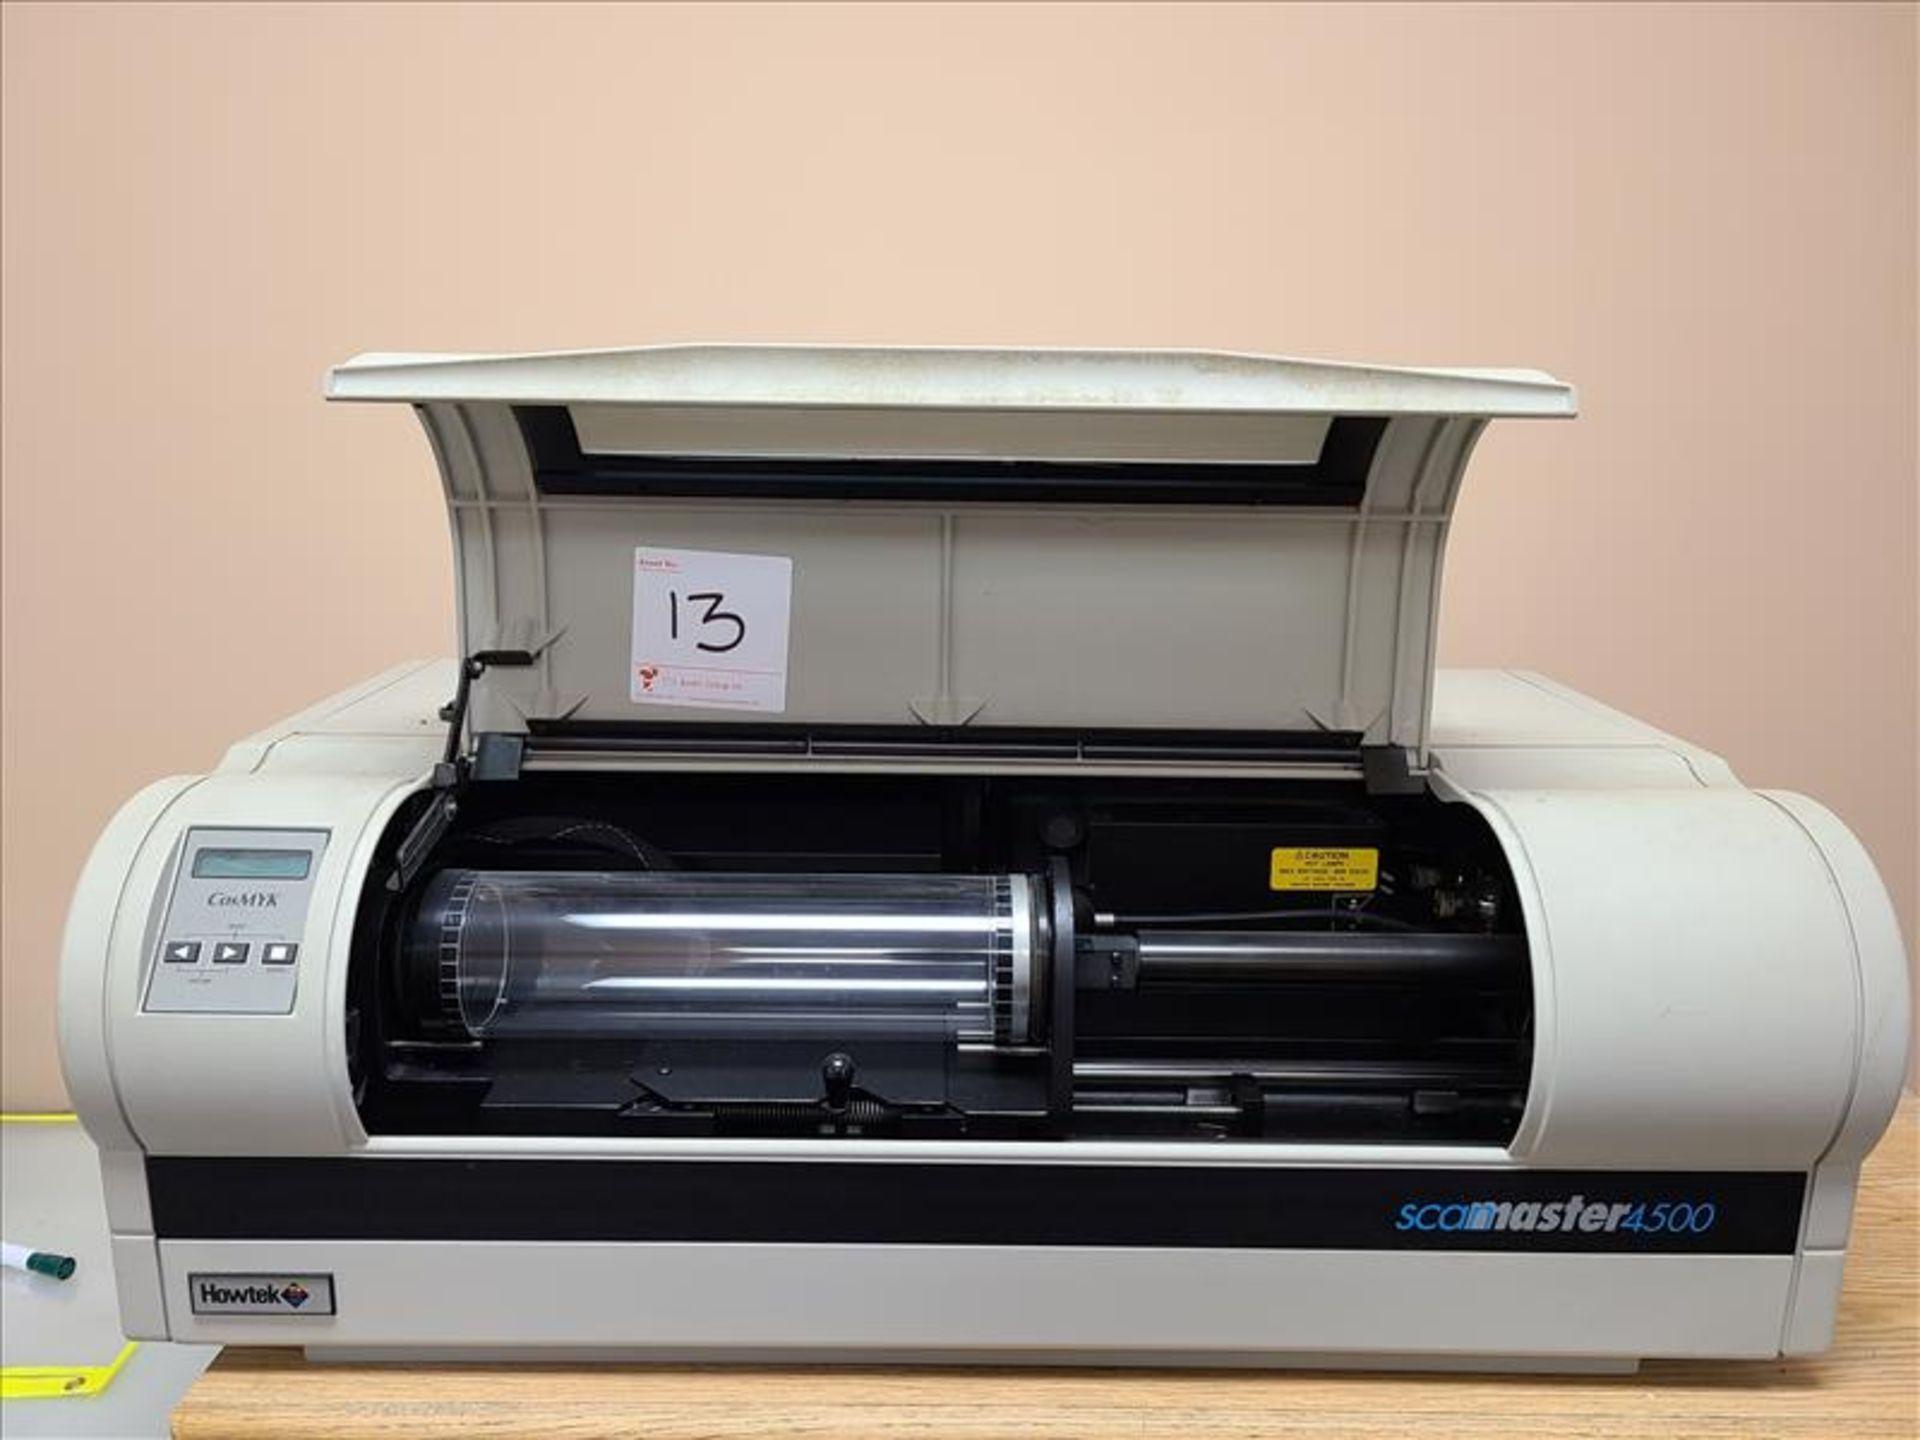 Howtek Drum Scanner, Scanmaster 4500, model D4000-02, S/N. S51010HC, 100-240V, 3 amps, 50Hz